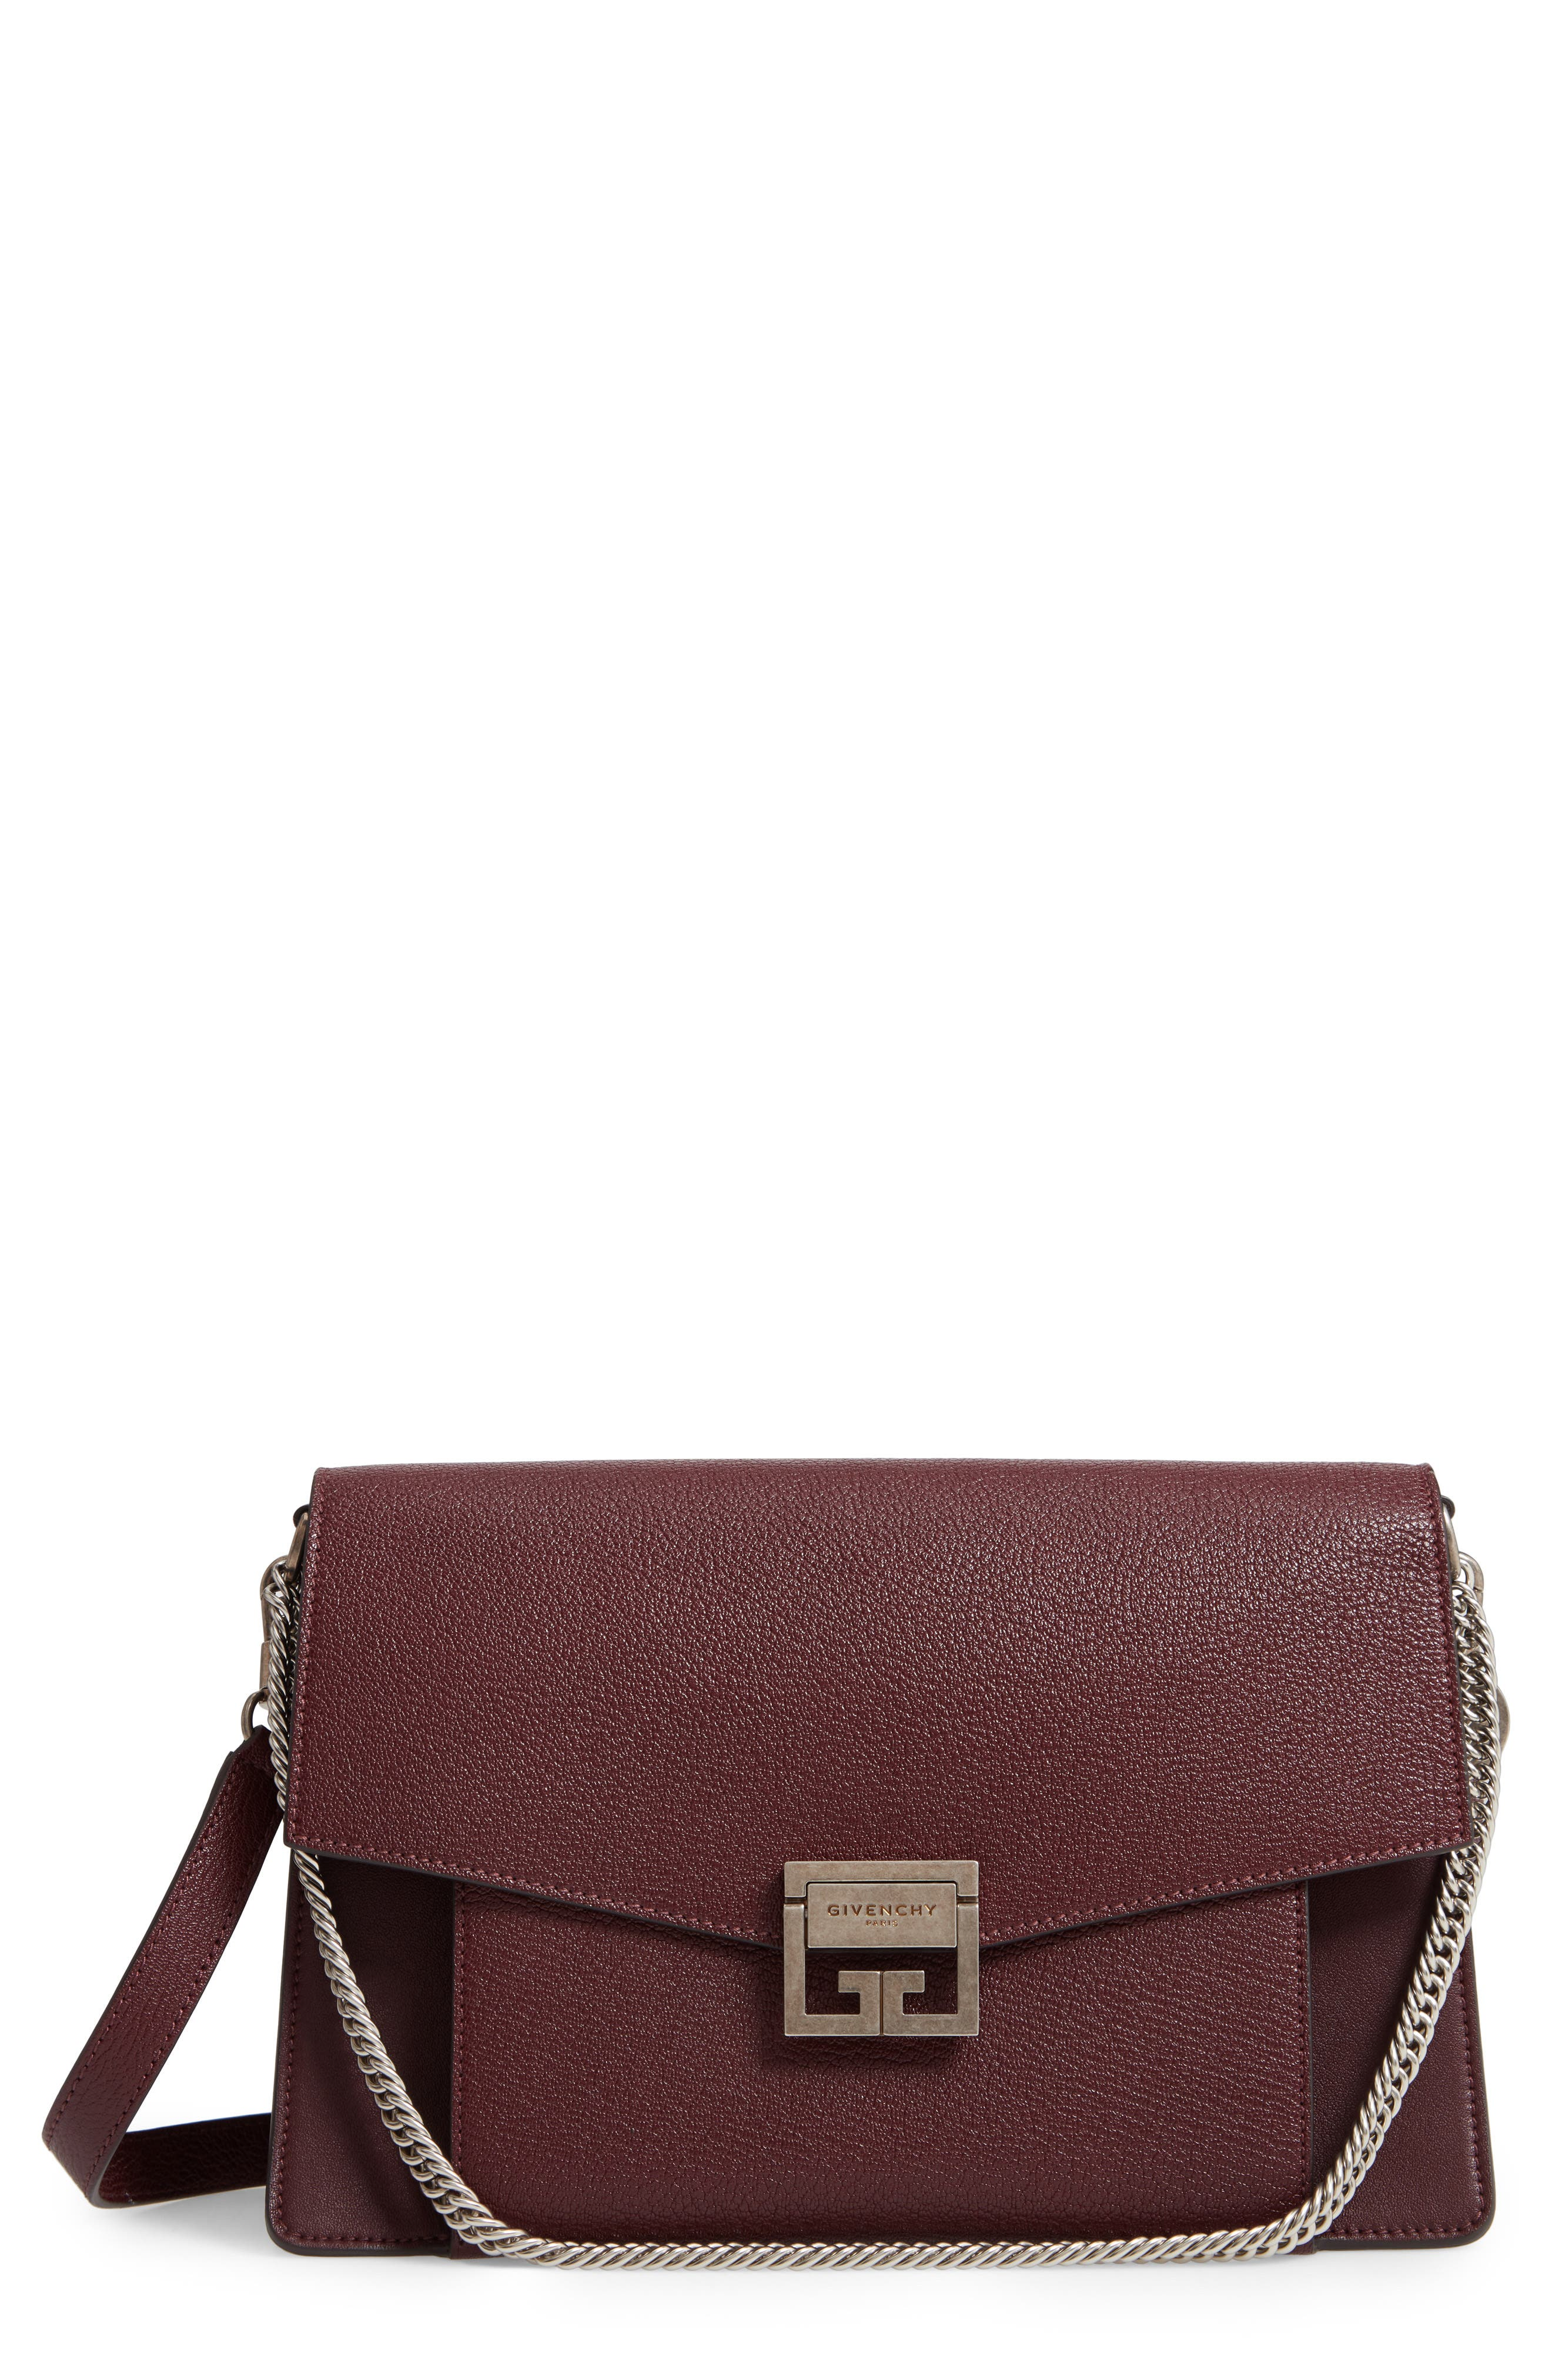 GV3 Goatskin Leather Shoulder Bag,                             Main thumbnail 1, color,                             AUBERGINE